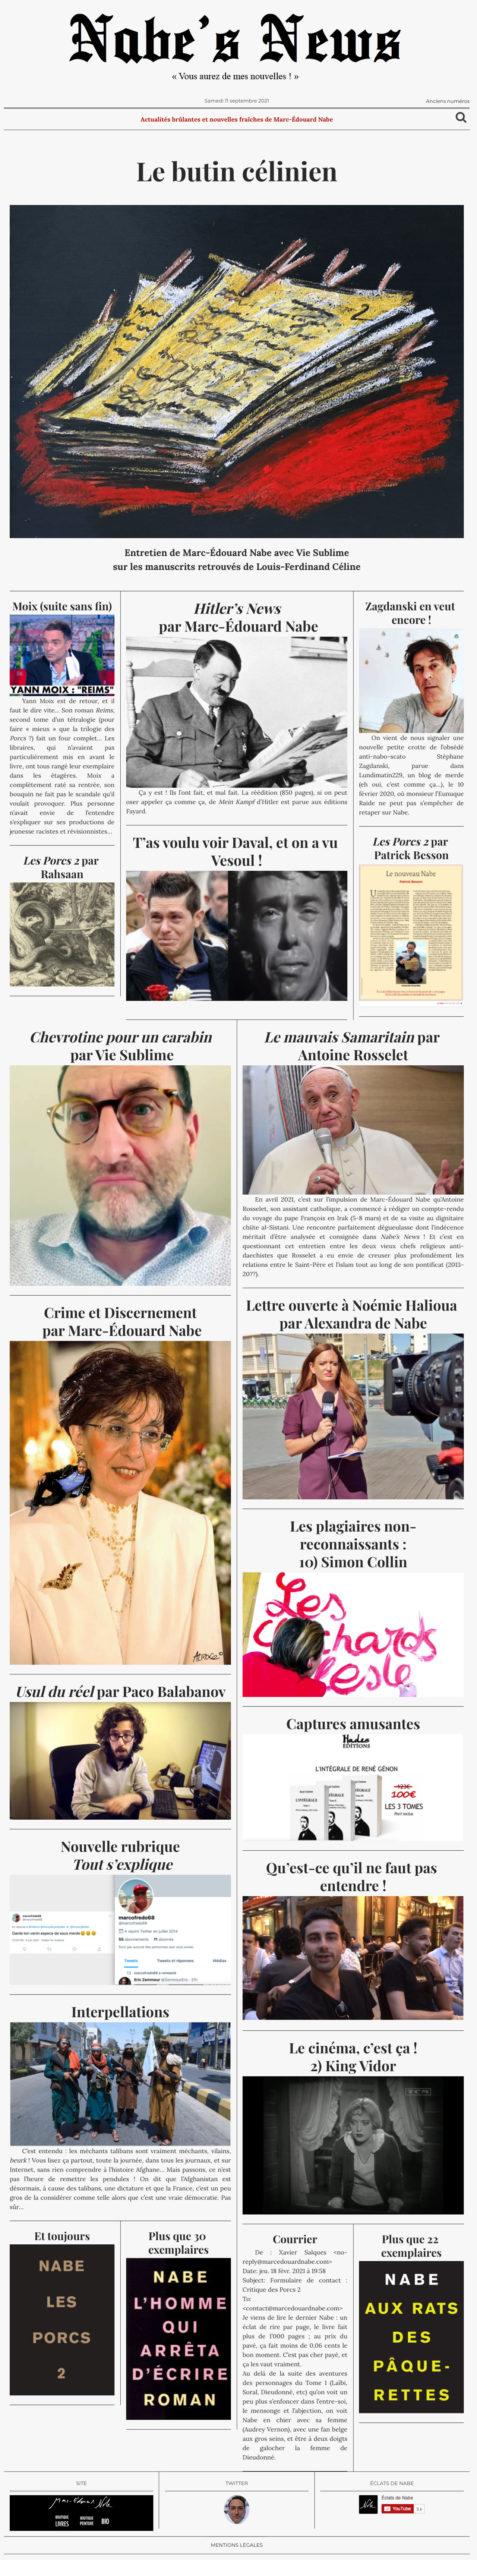 Nabe's News - Numéro 30 - Louis-Ferdinand Céline - Yann Moix - Adolf Hitler - Stéphane Zagdanski - Jonathann Daval - Patrick Besson - Noémie Halioua